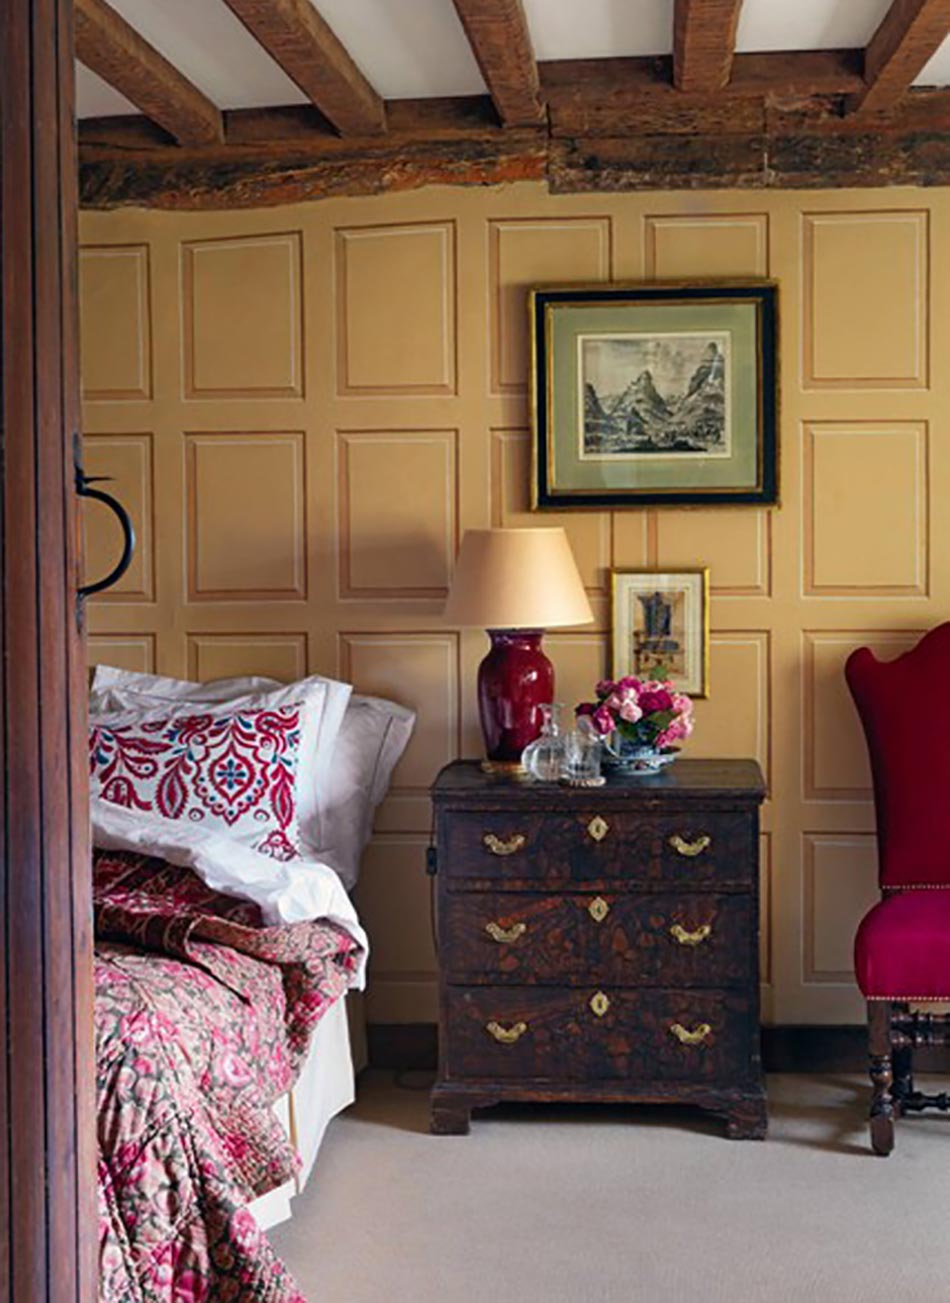 Chambre ambiance campagne design de maison for Chambre ambiance nature